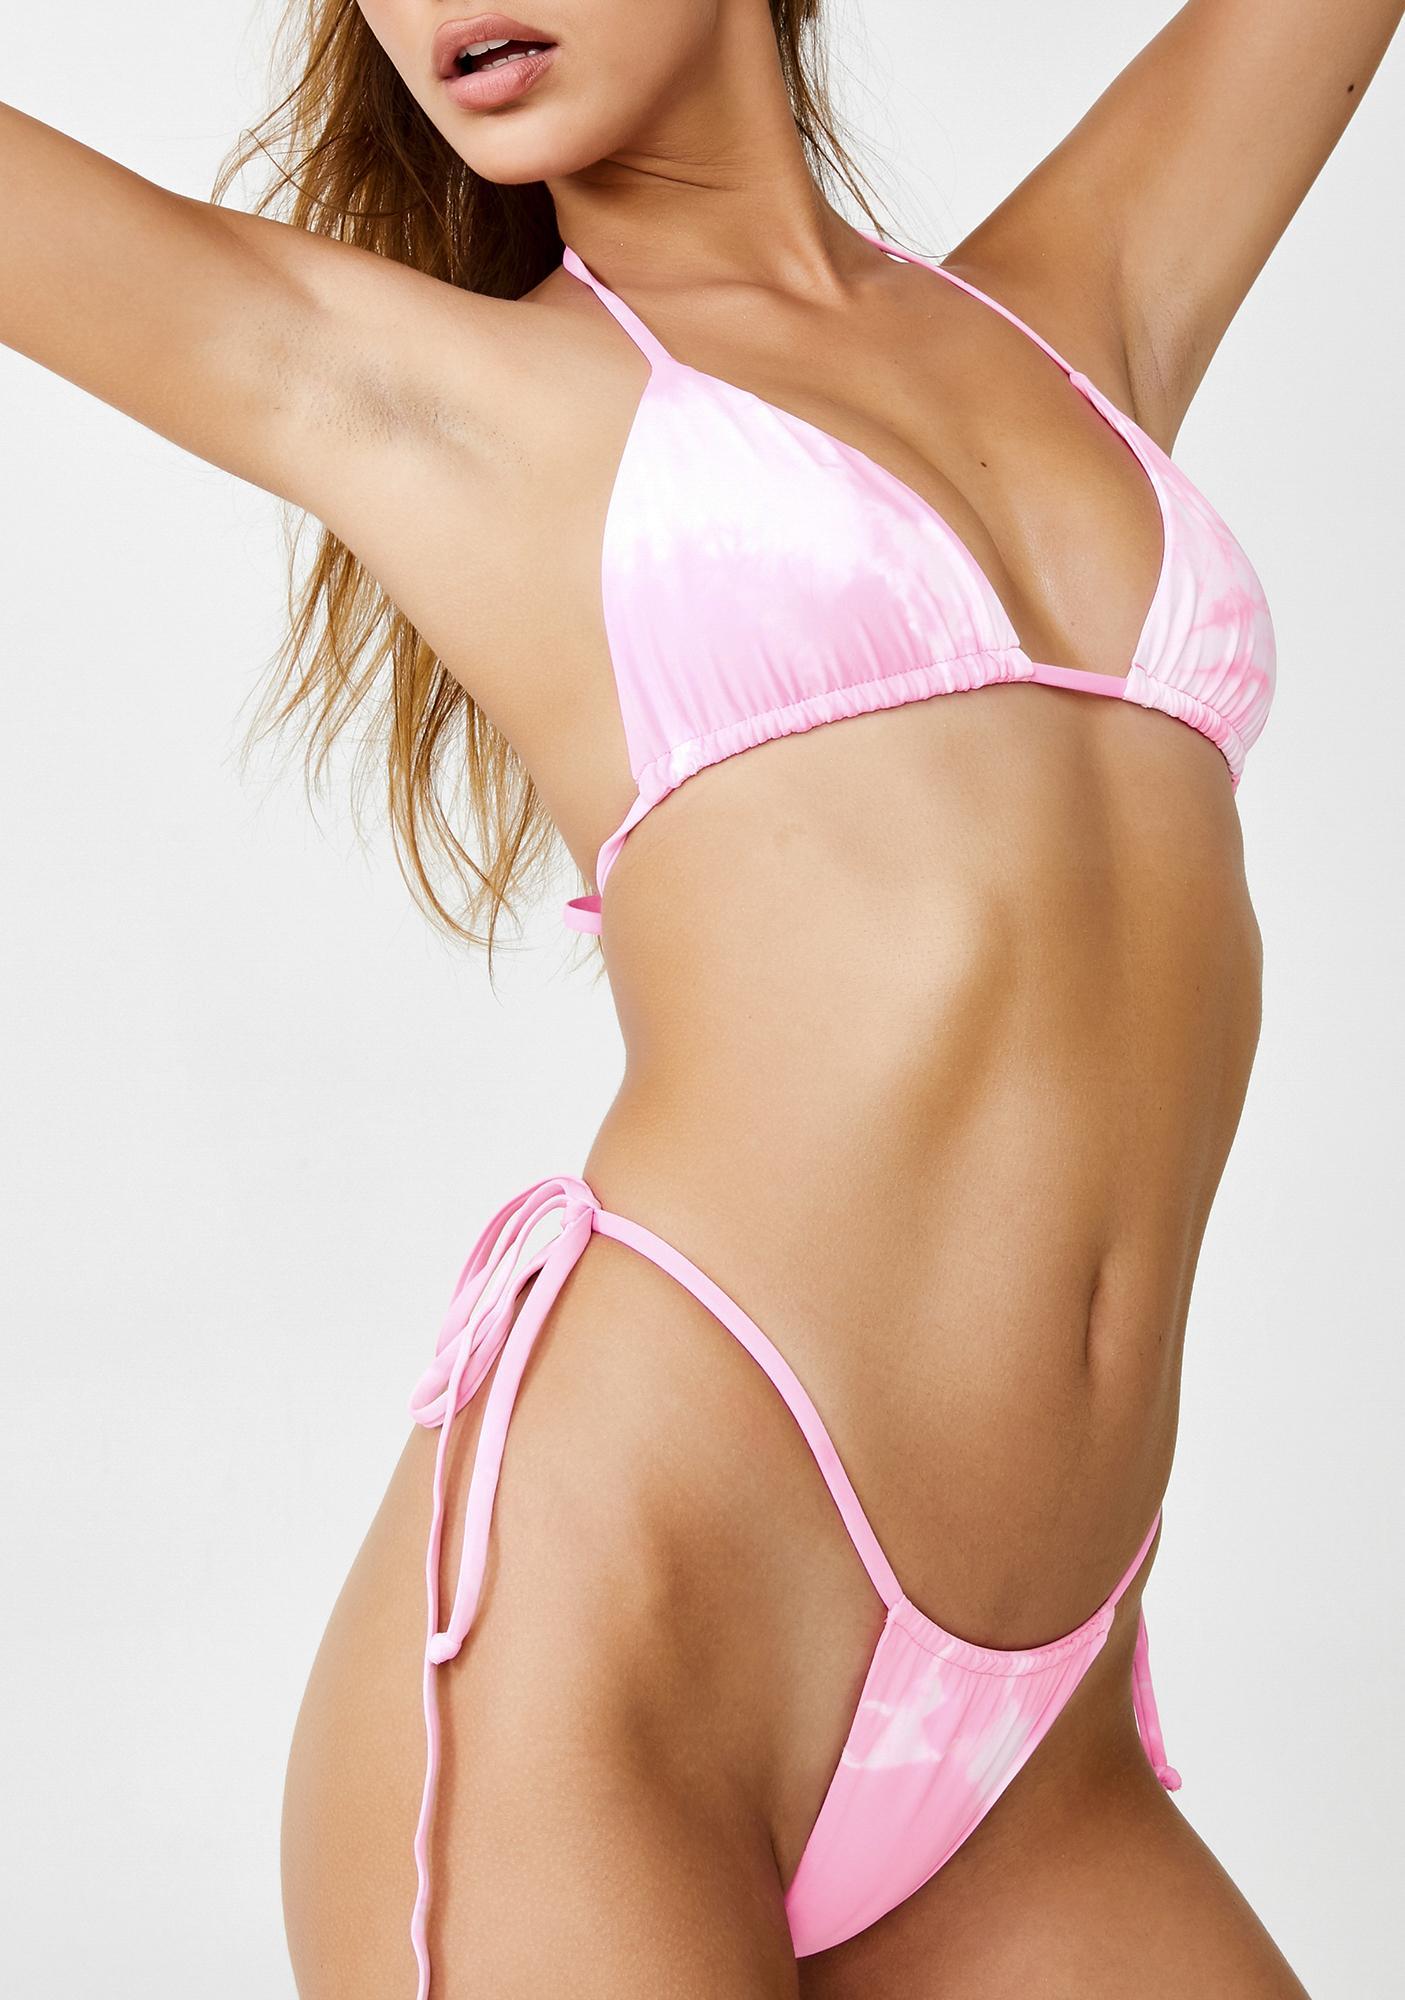 Frankies Bikinis X Sofia Richie Tasha Bikini Bottoms